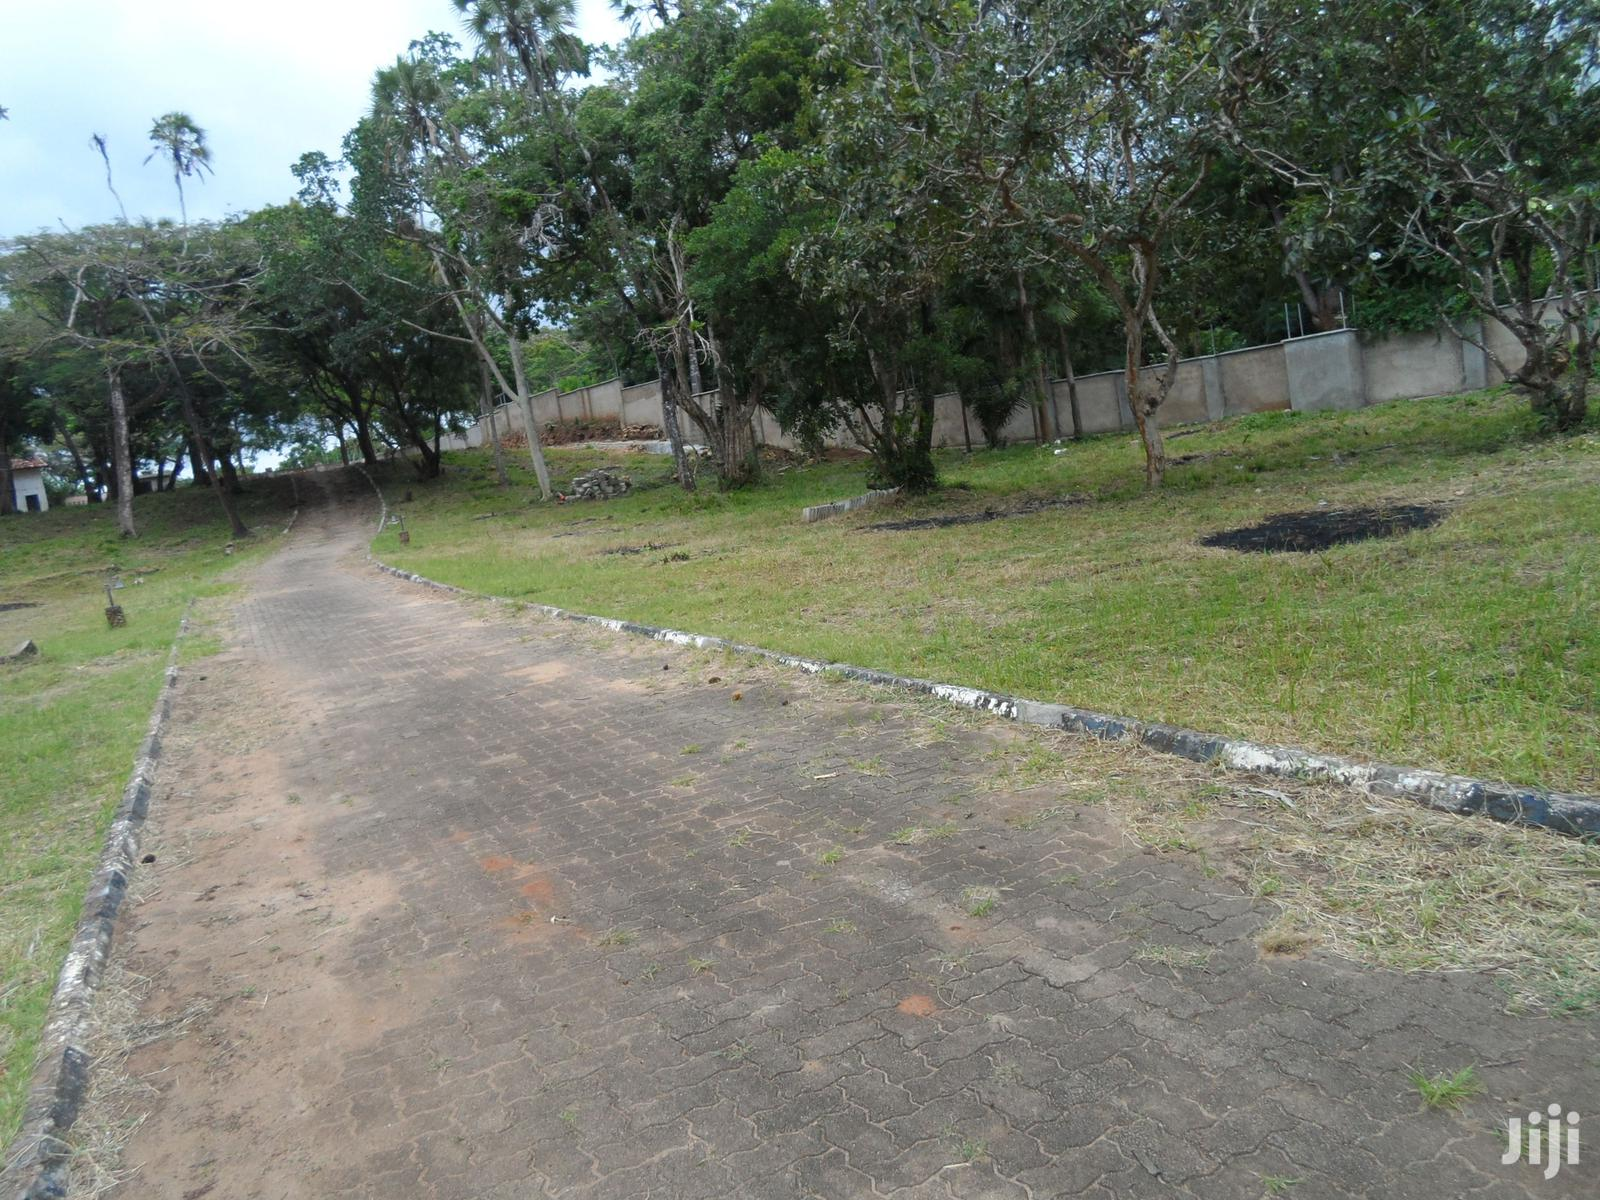 Quarter Acre on Sale in Controlled Area/Benford Homes   Land & Plots For Sale for sale in Mtwapa, Kilifi, Kenya